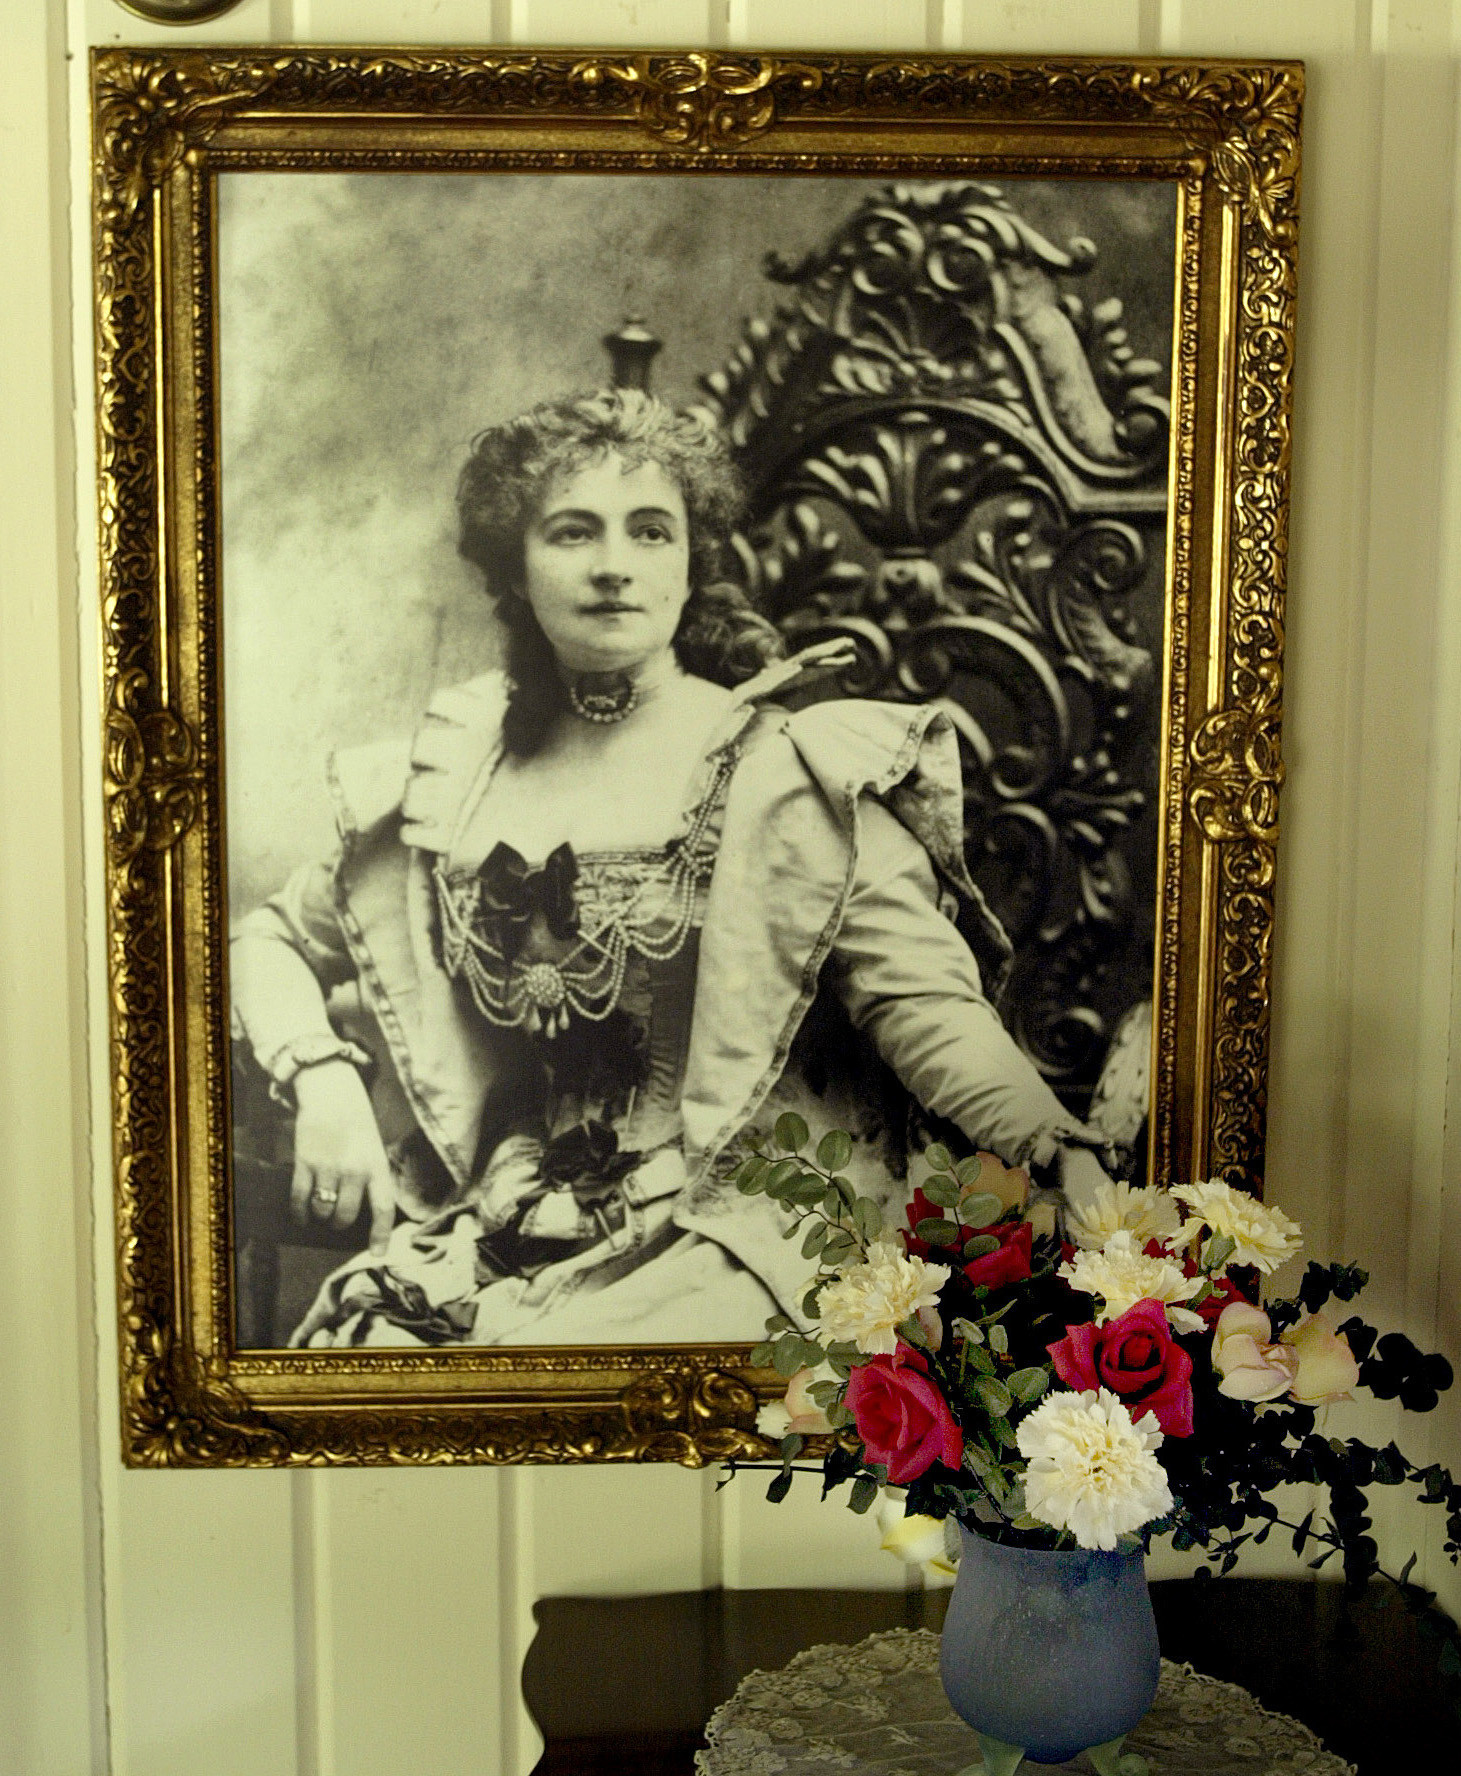 A portrait of Helena Modjeska at her former home, the Helena Modjeska Historic House and Gardens in Silverado.